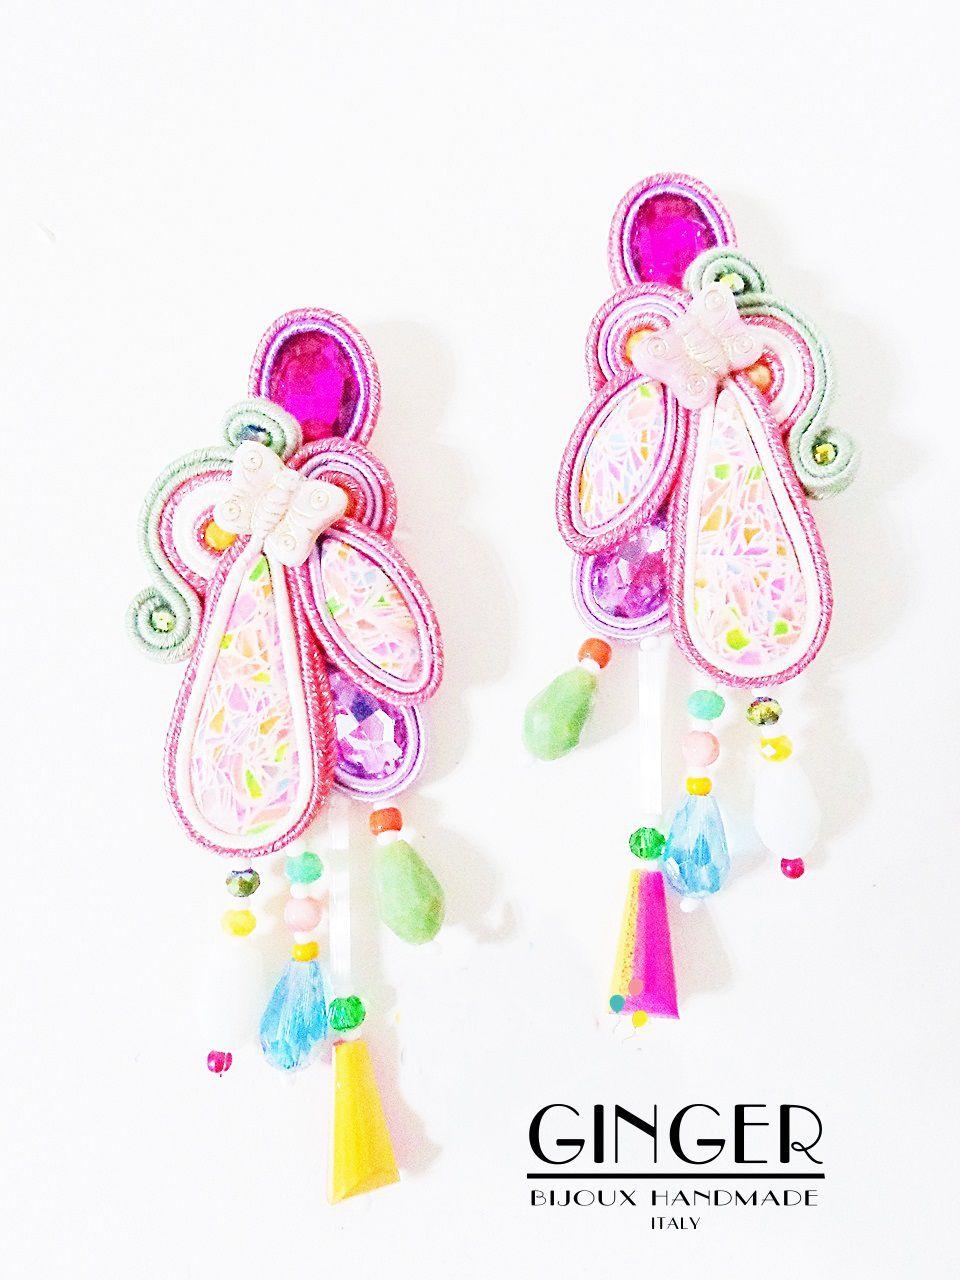 birthday chandeliers gift gingerbijoux madeinitaly earrings soutache handmade